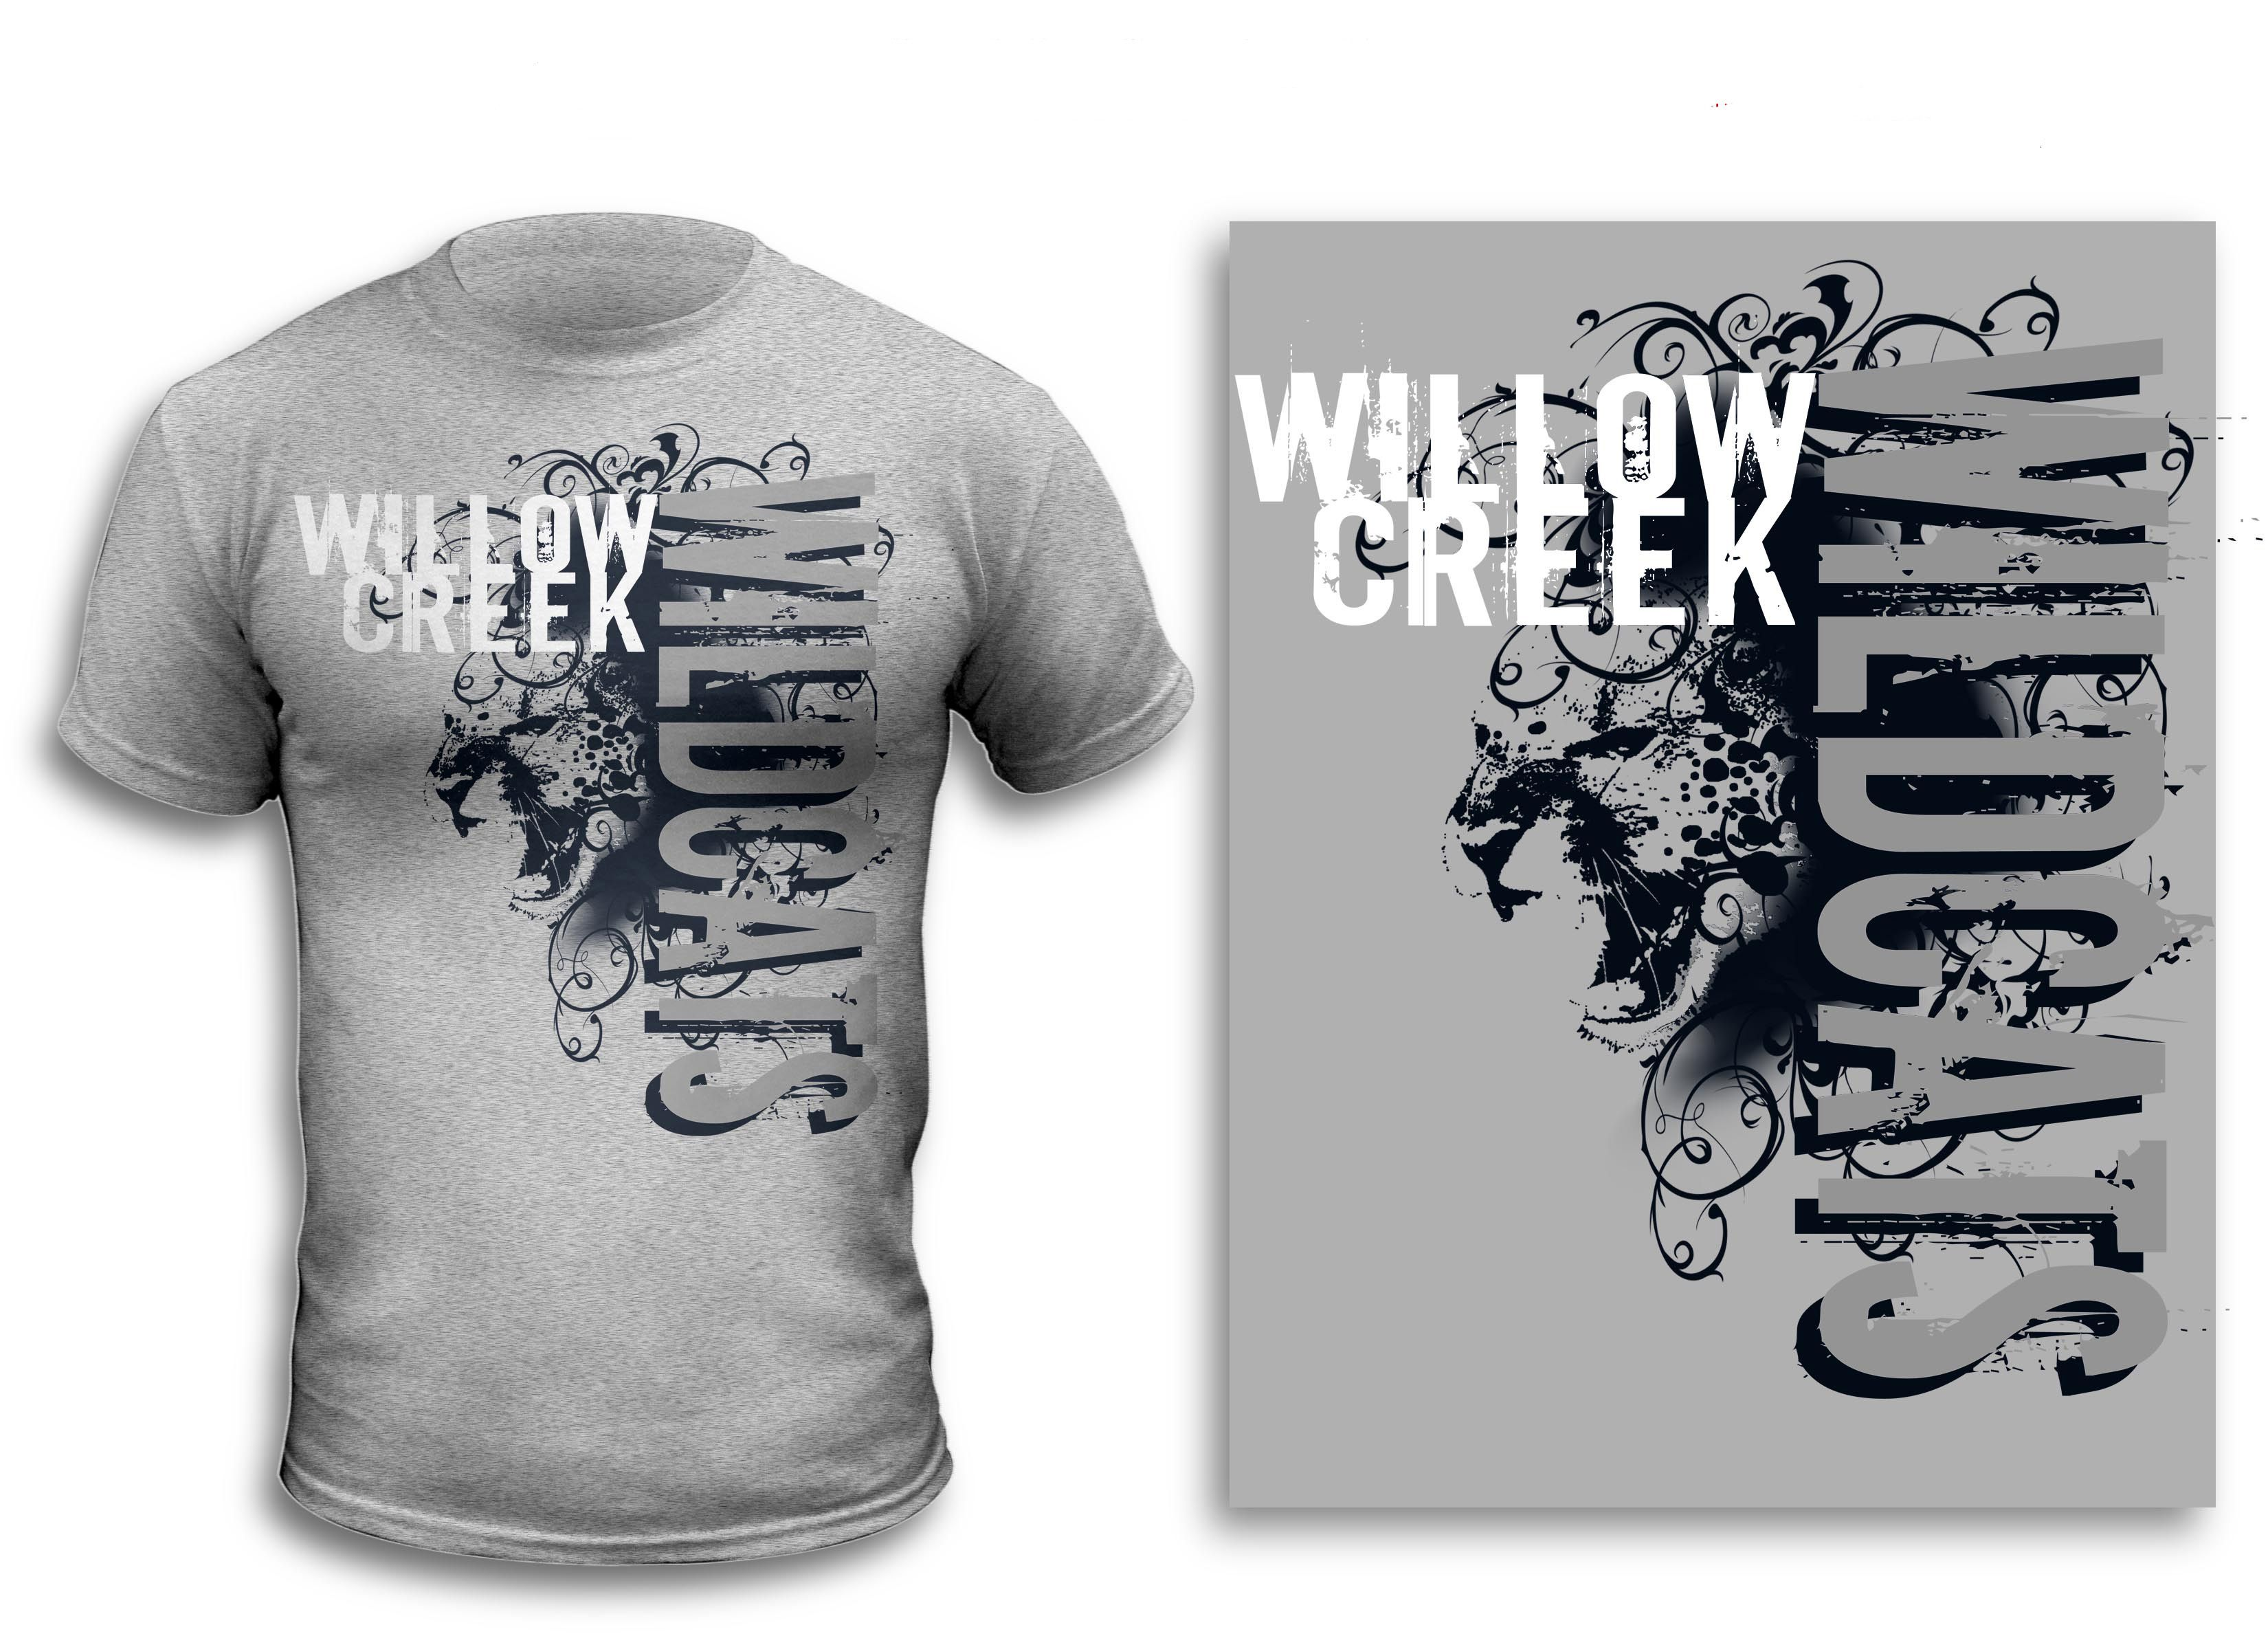 Shirt design ideas for school raxoefut